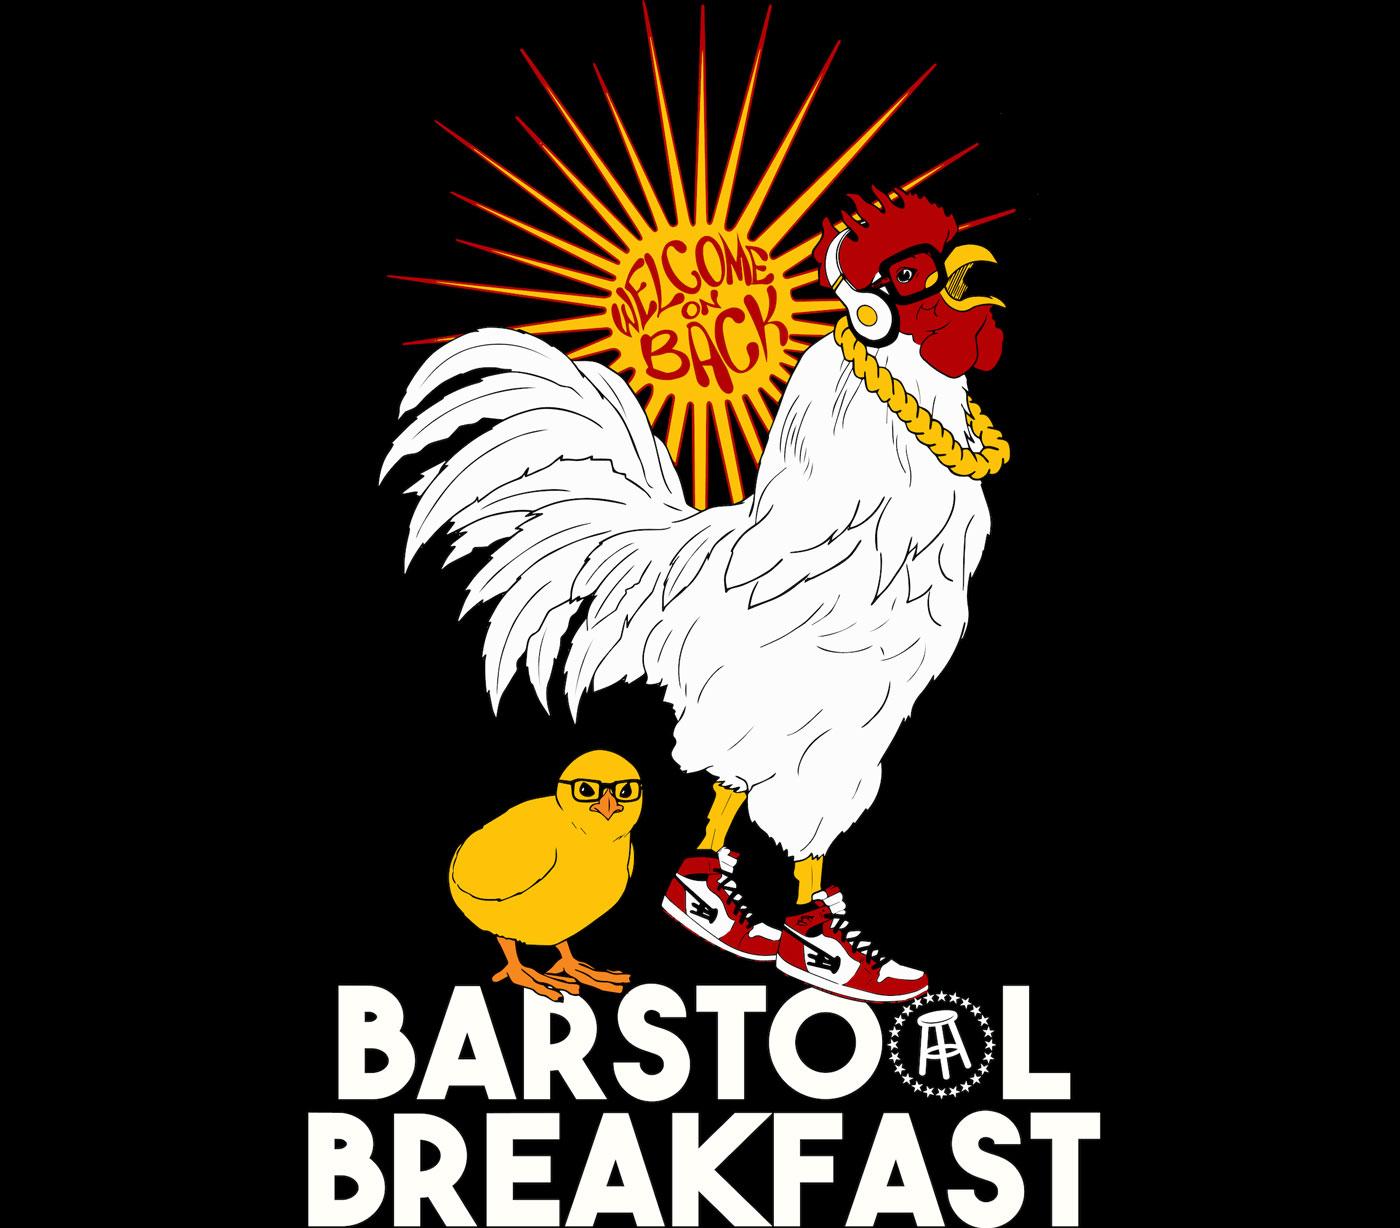 barstool-breakfast.jpg